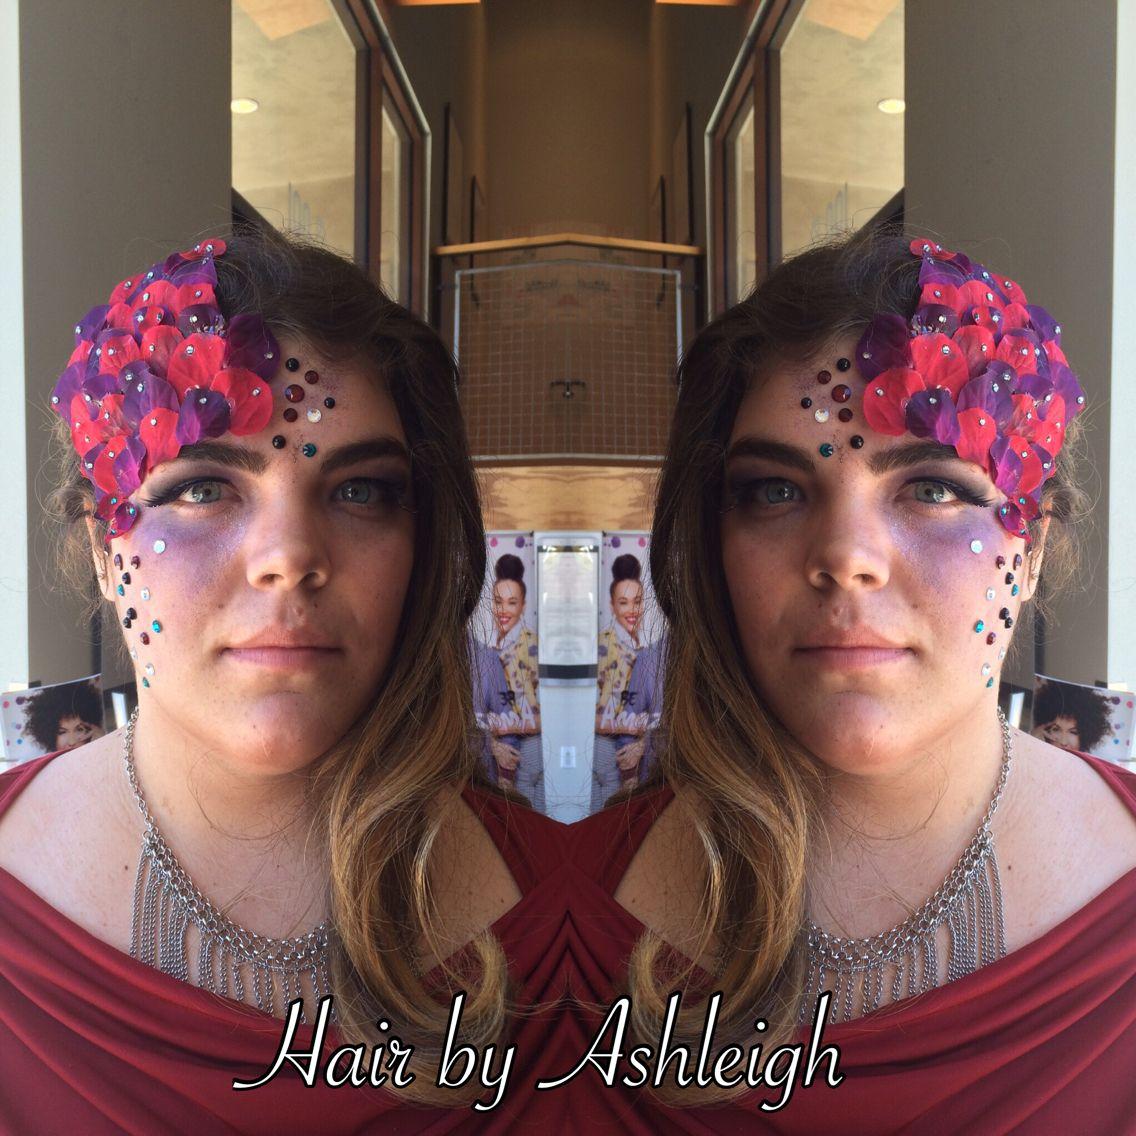 #avantgarde #avant #garde #red #purple #fashionshow #graduation #makeup #glitter #diamonds #curledhair #curlyhair #style #eyebrows